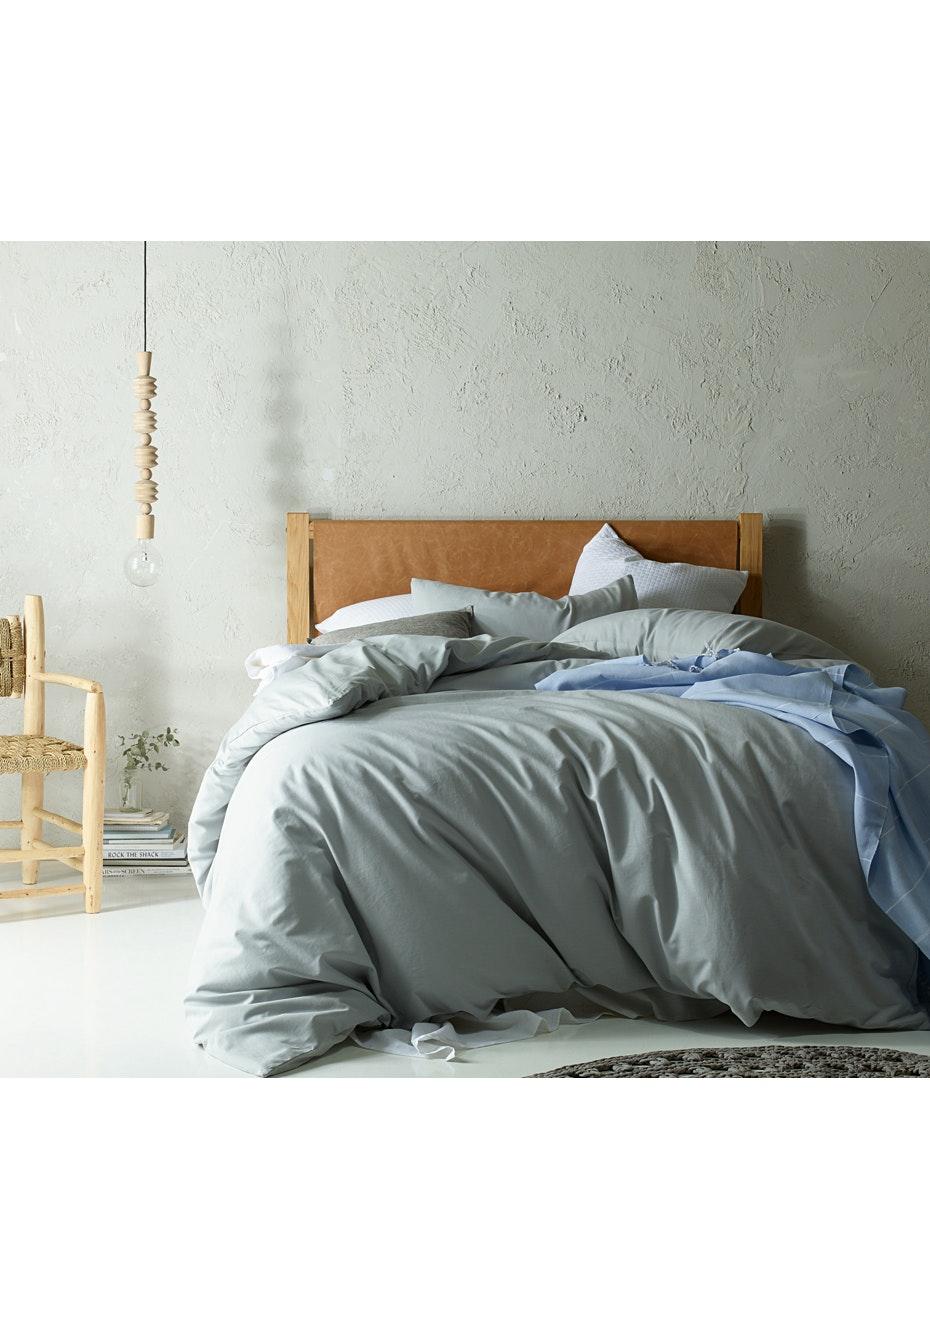 King Bed Silver Ash Linen Cotton Quilt Cover Set